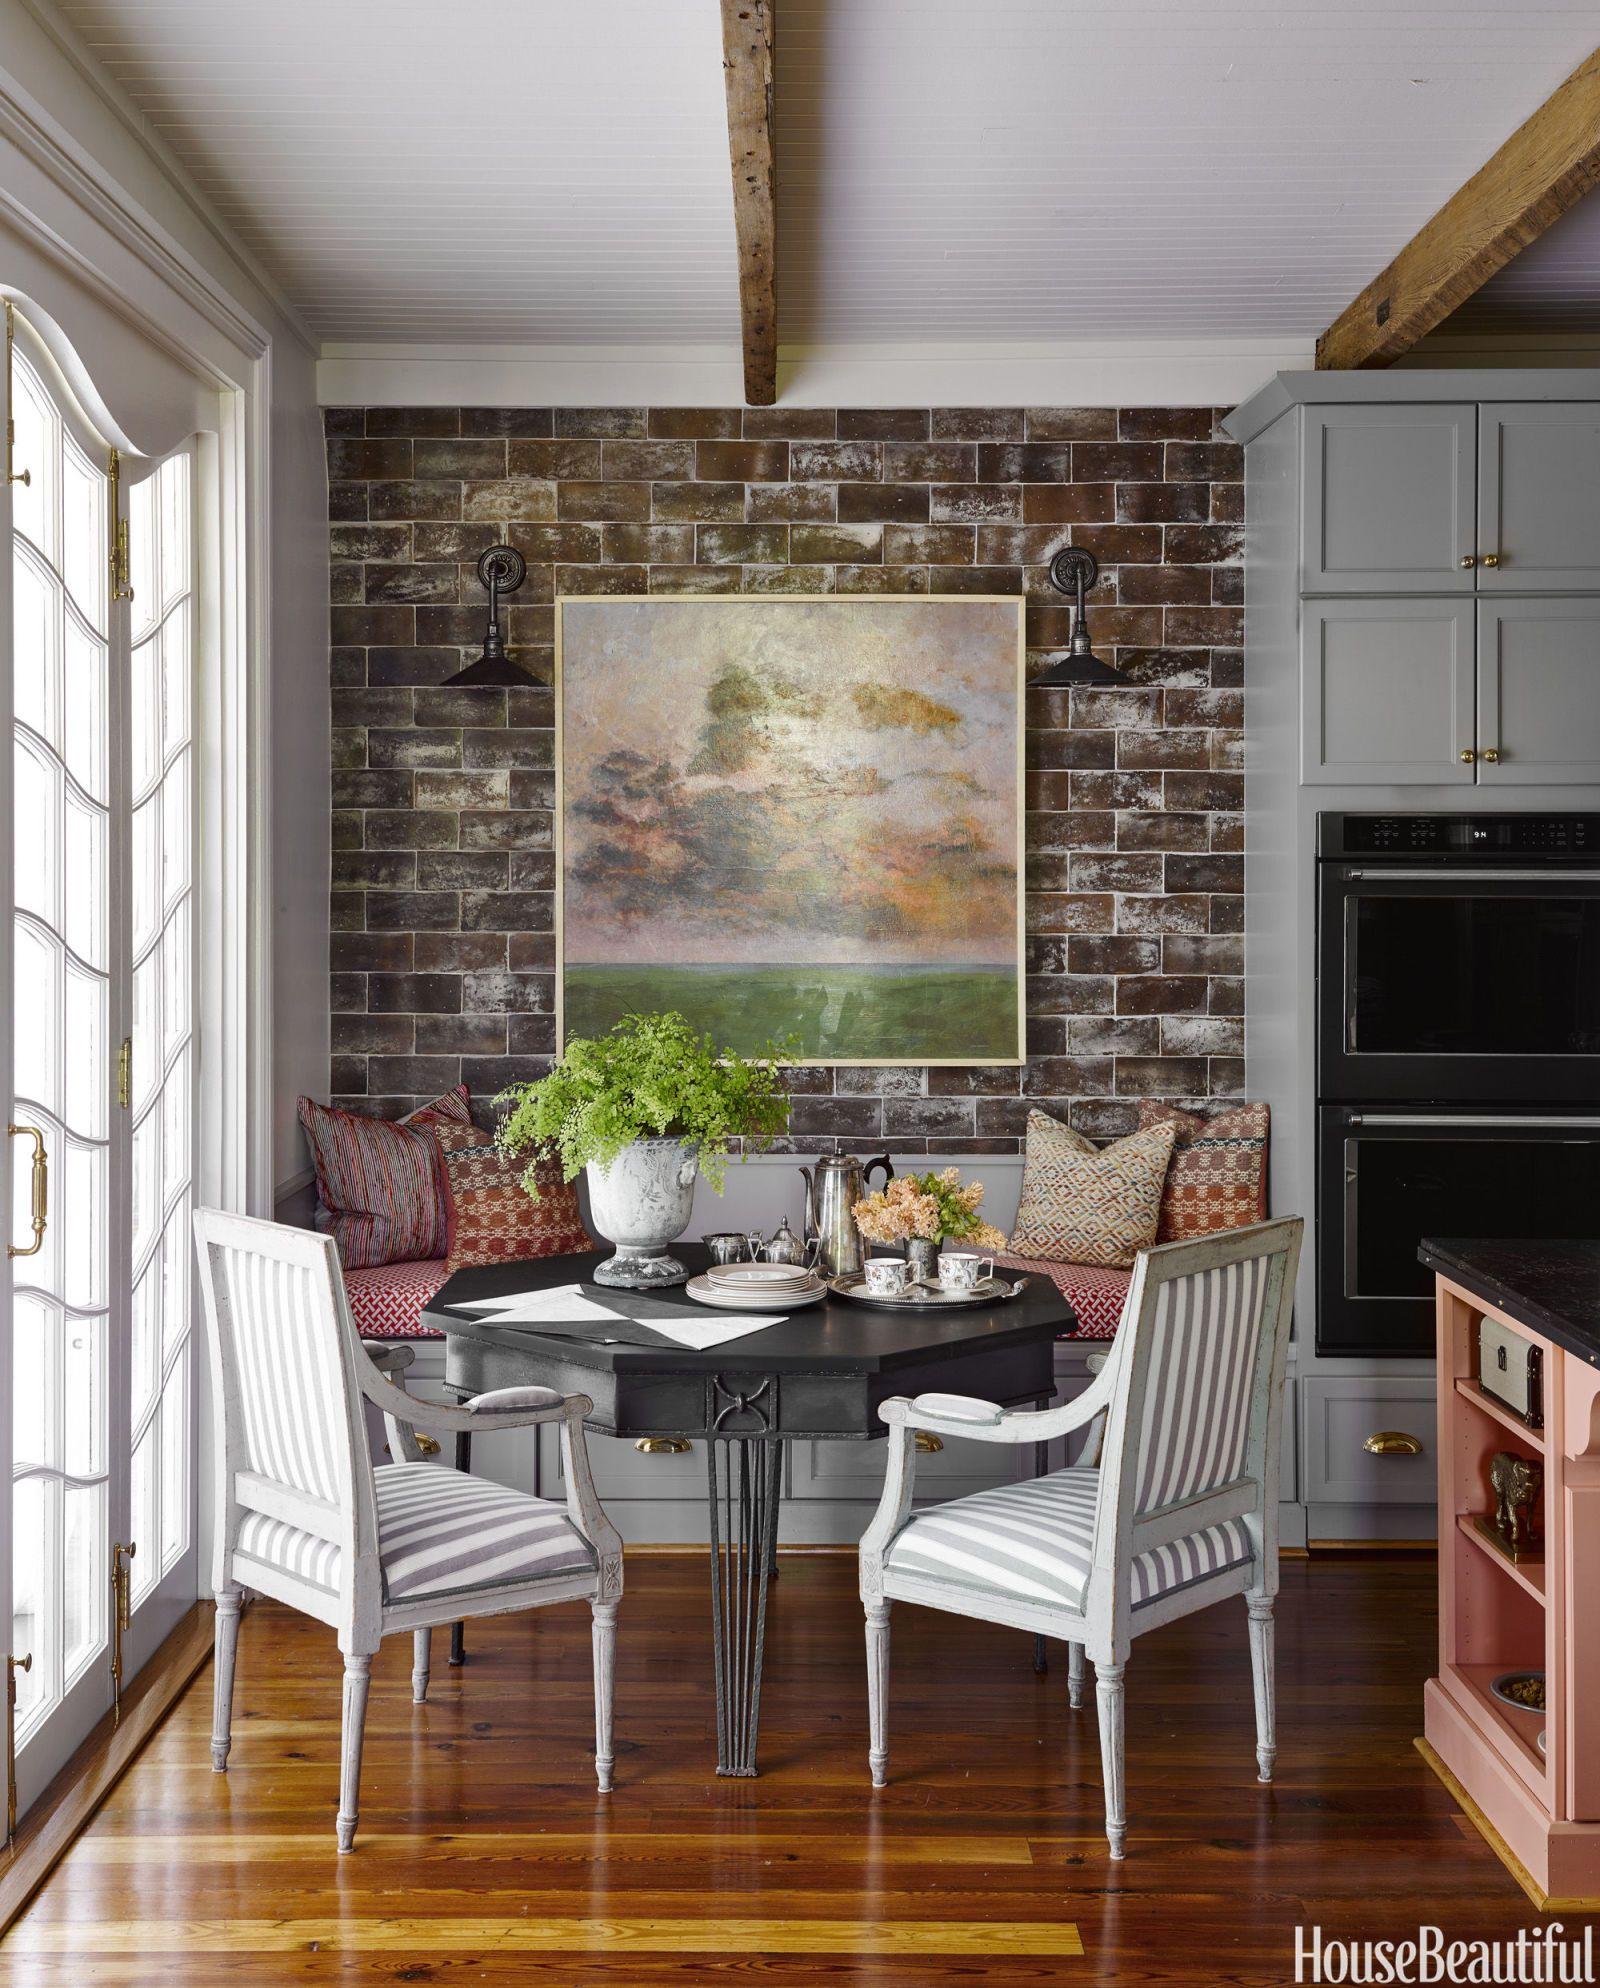 Home Beautiful Kitchens Magazine